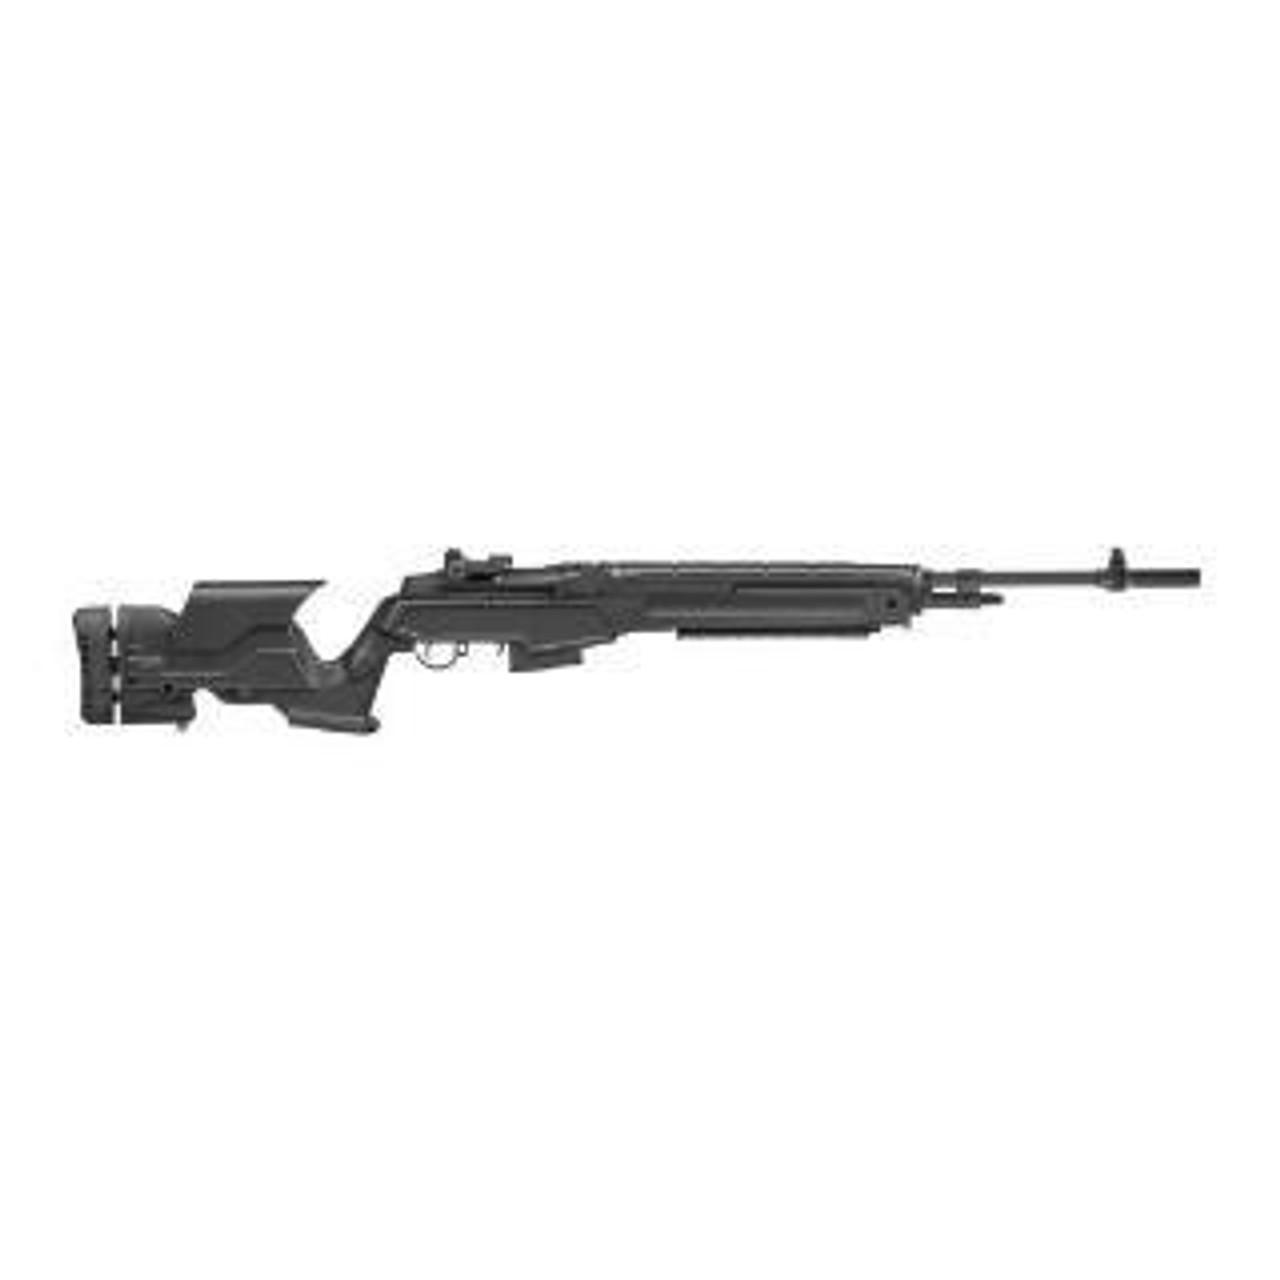 Springfield Armory M1A-Precision Adjustable Rifle-CALIFORNIA LEGAL-.308-Black